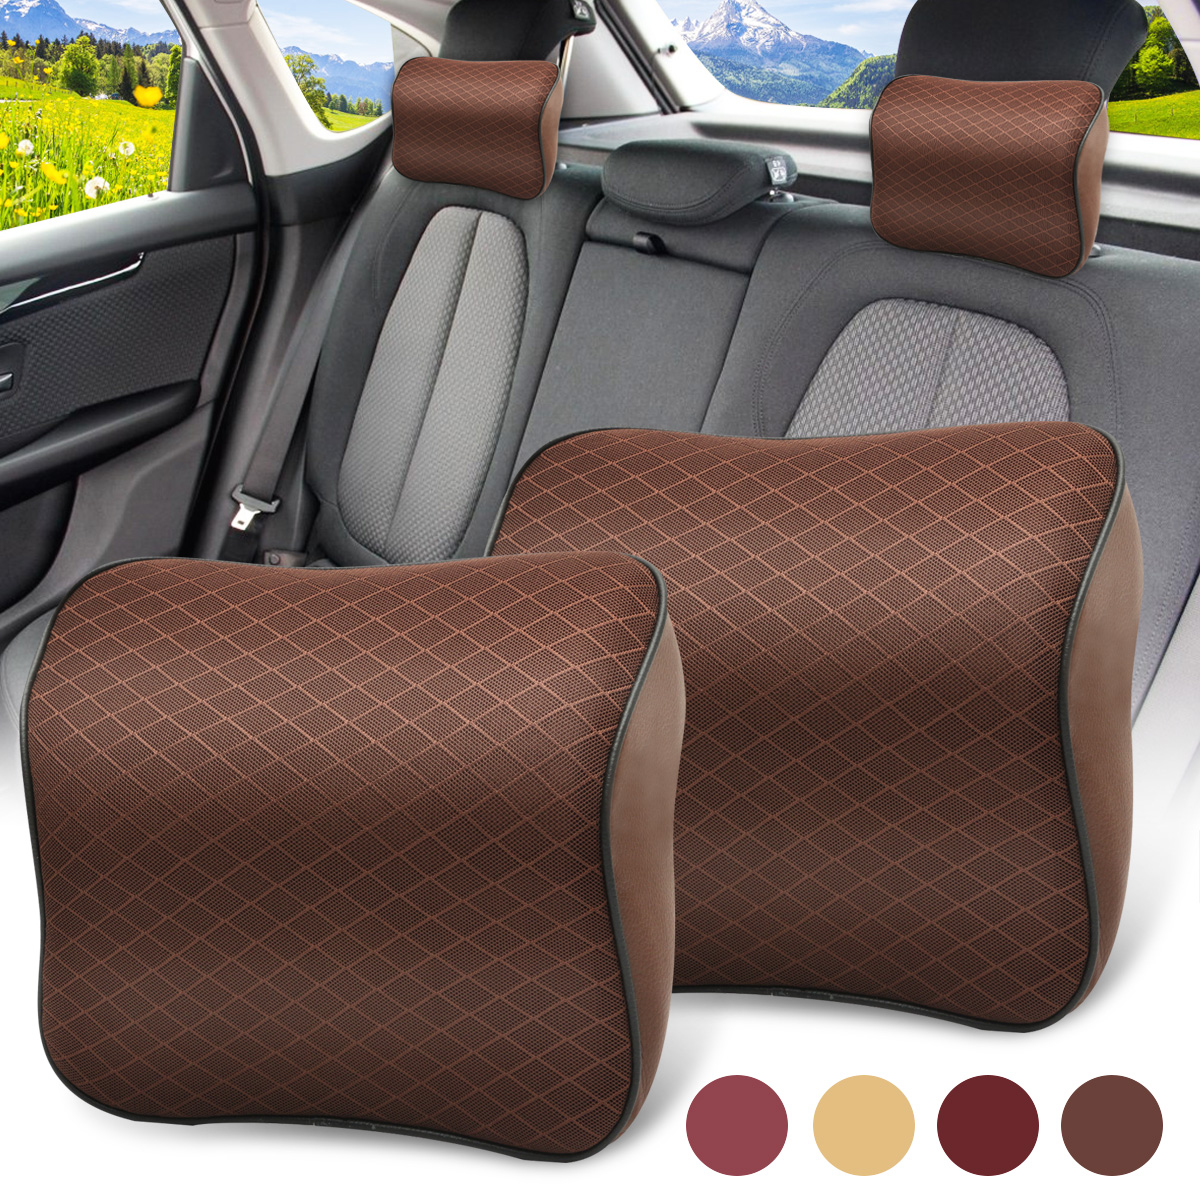 Neck Cushion Car Seat neckguard cushion Headrest Pillow Breathable Mesh PU Leather Pad Memory Foam (Color: Beige, Wine red, Coffee, Purple)